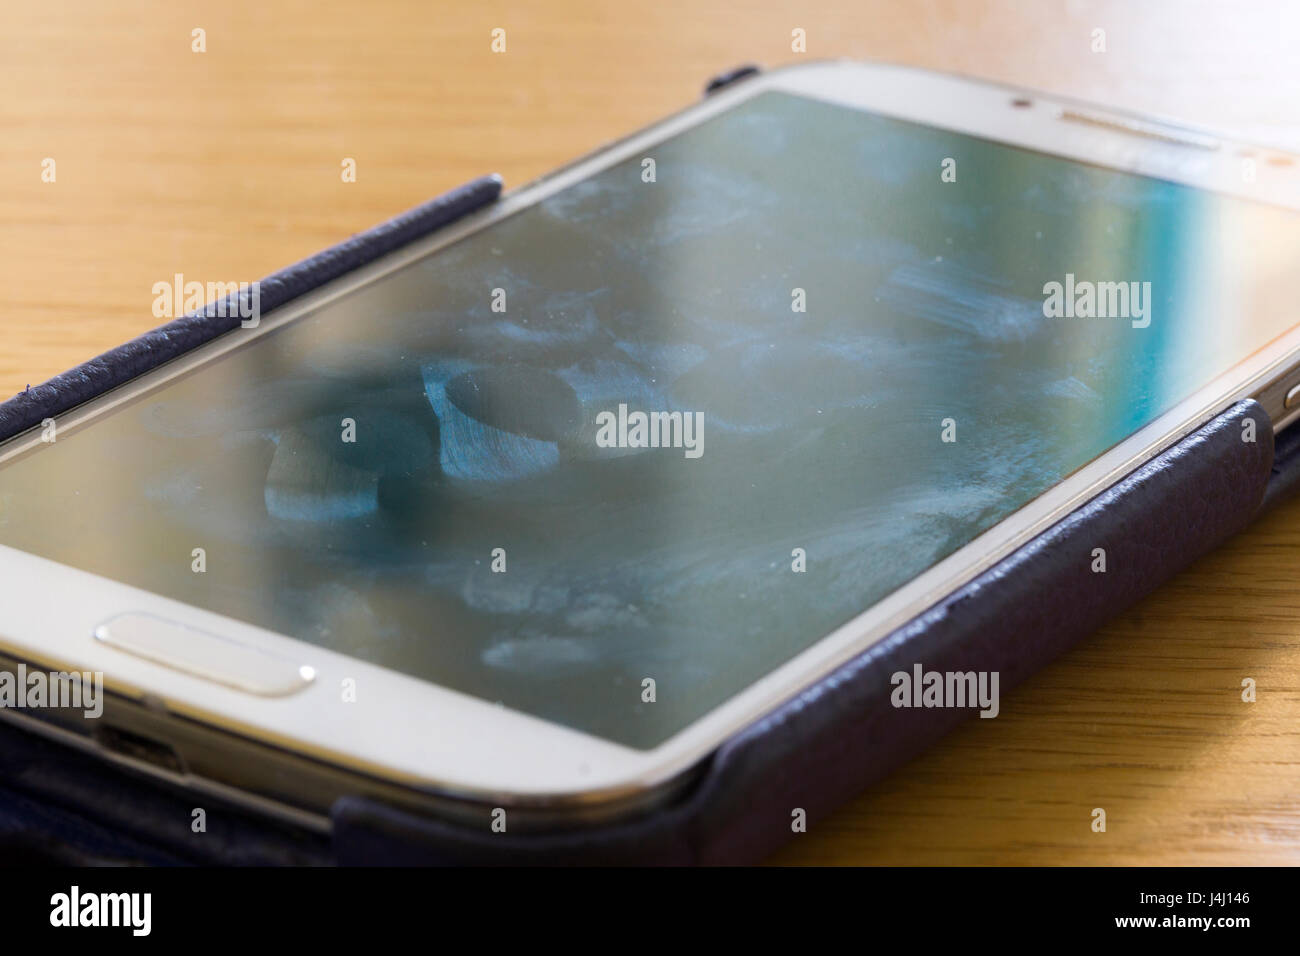 A closeup on a smartscreen screen showing smears and fingerprints - Stock Image